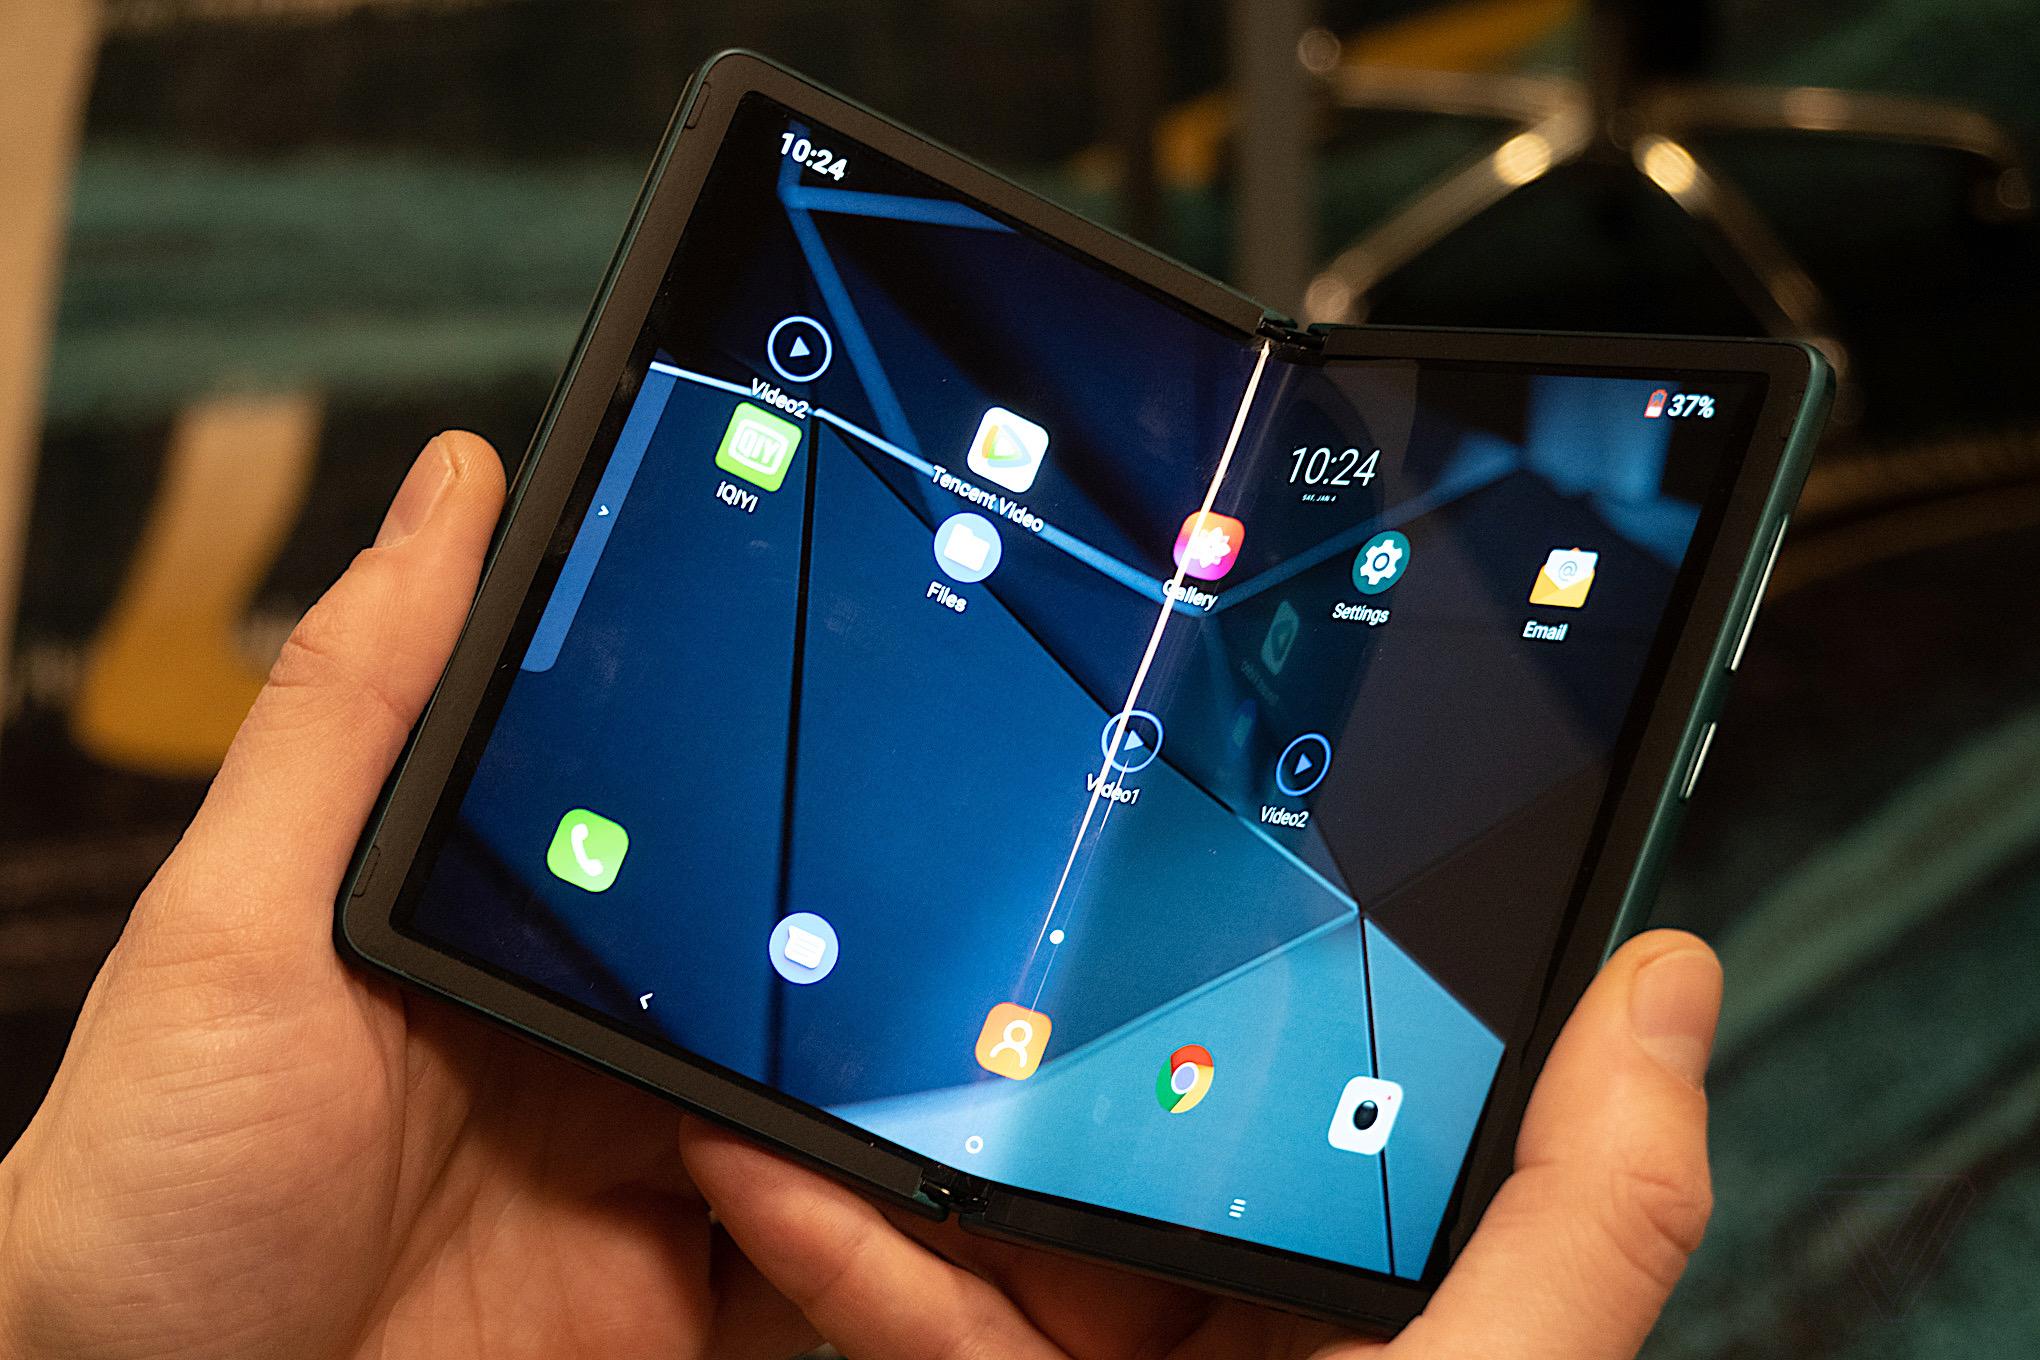 CES 2020: 5G Laptops, Foldable Phones, Chromebooks and 8K TVs